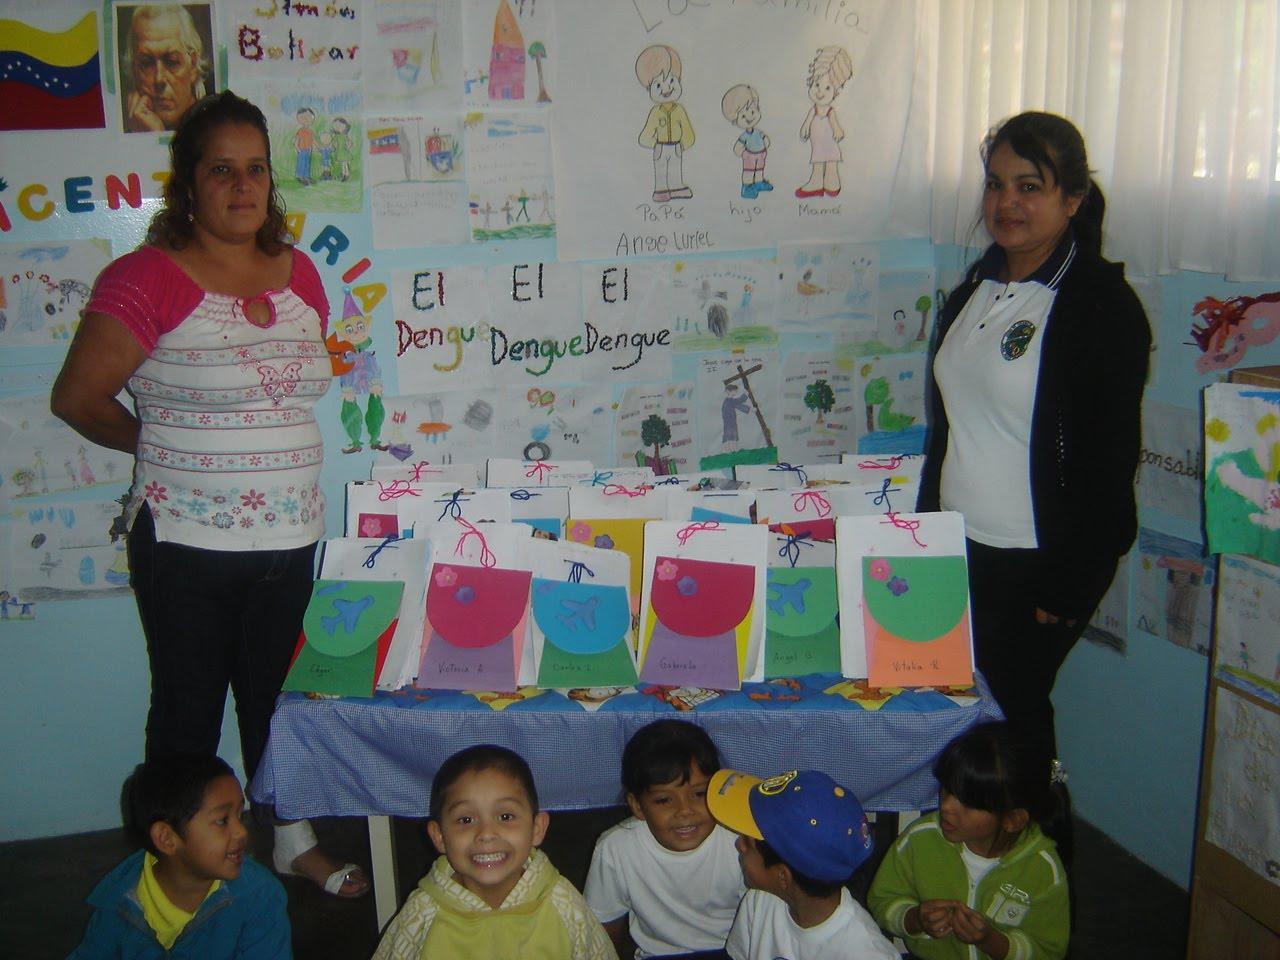 Jard n de infancia bolivariano juan ru z fajardo jard n de infancia bolivariana juan ru z fajardo - Tecnico jardin de infancia ...